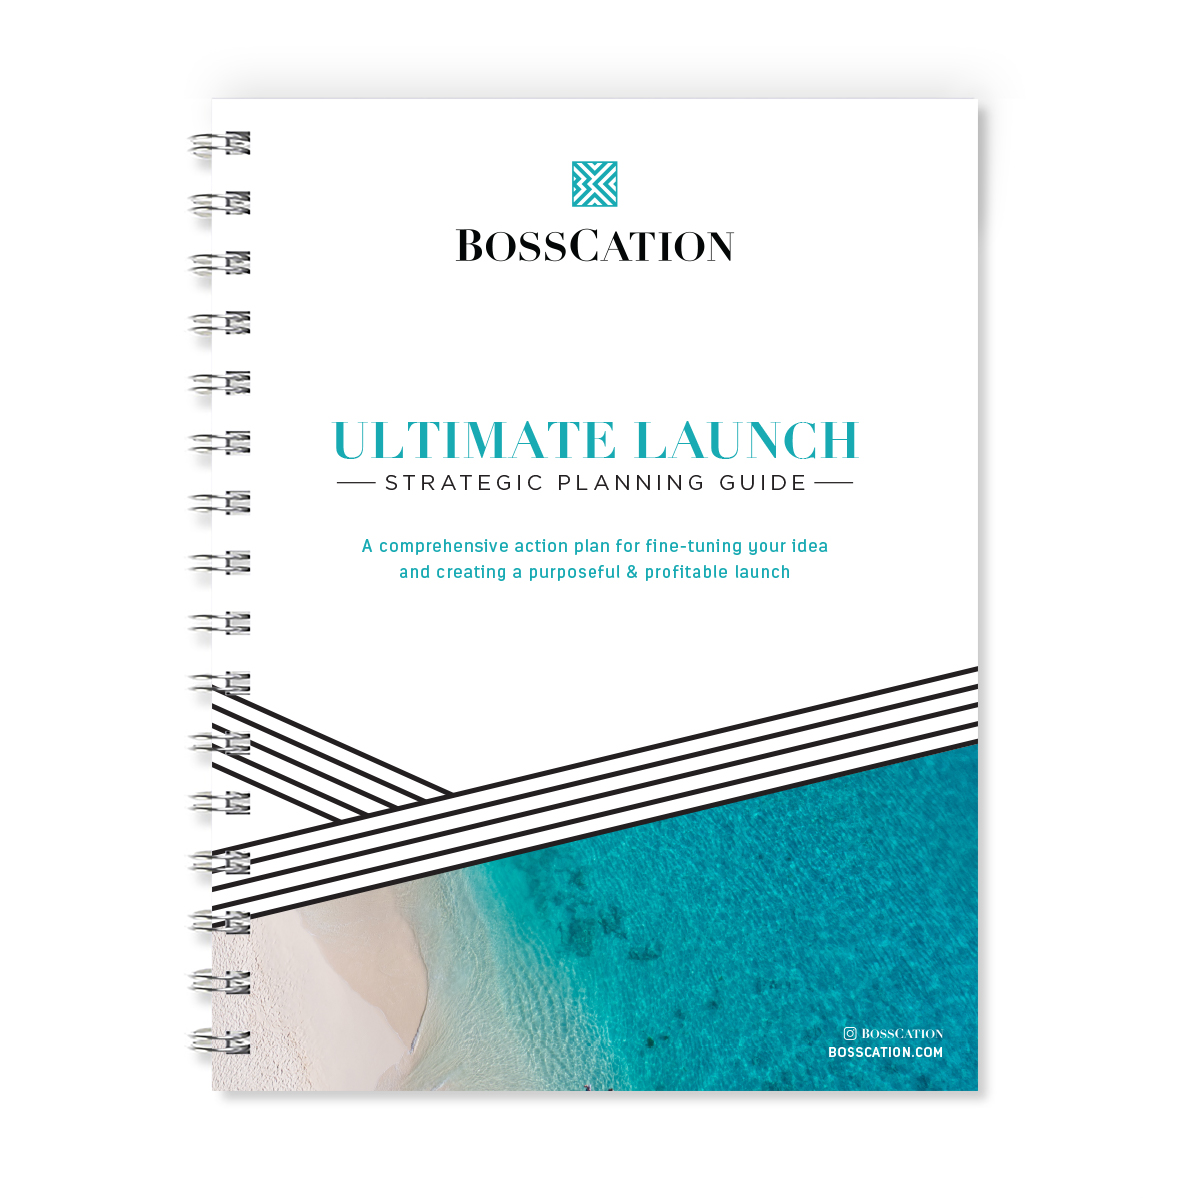 DIY-Launch-Planning-guide-workbook.jpg